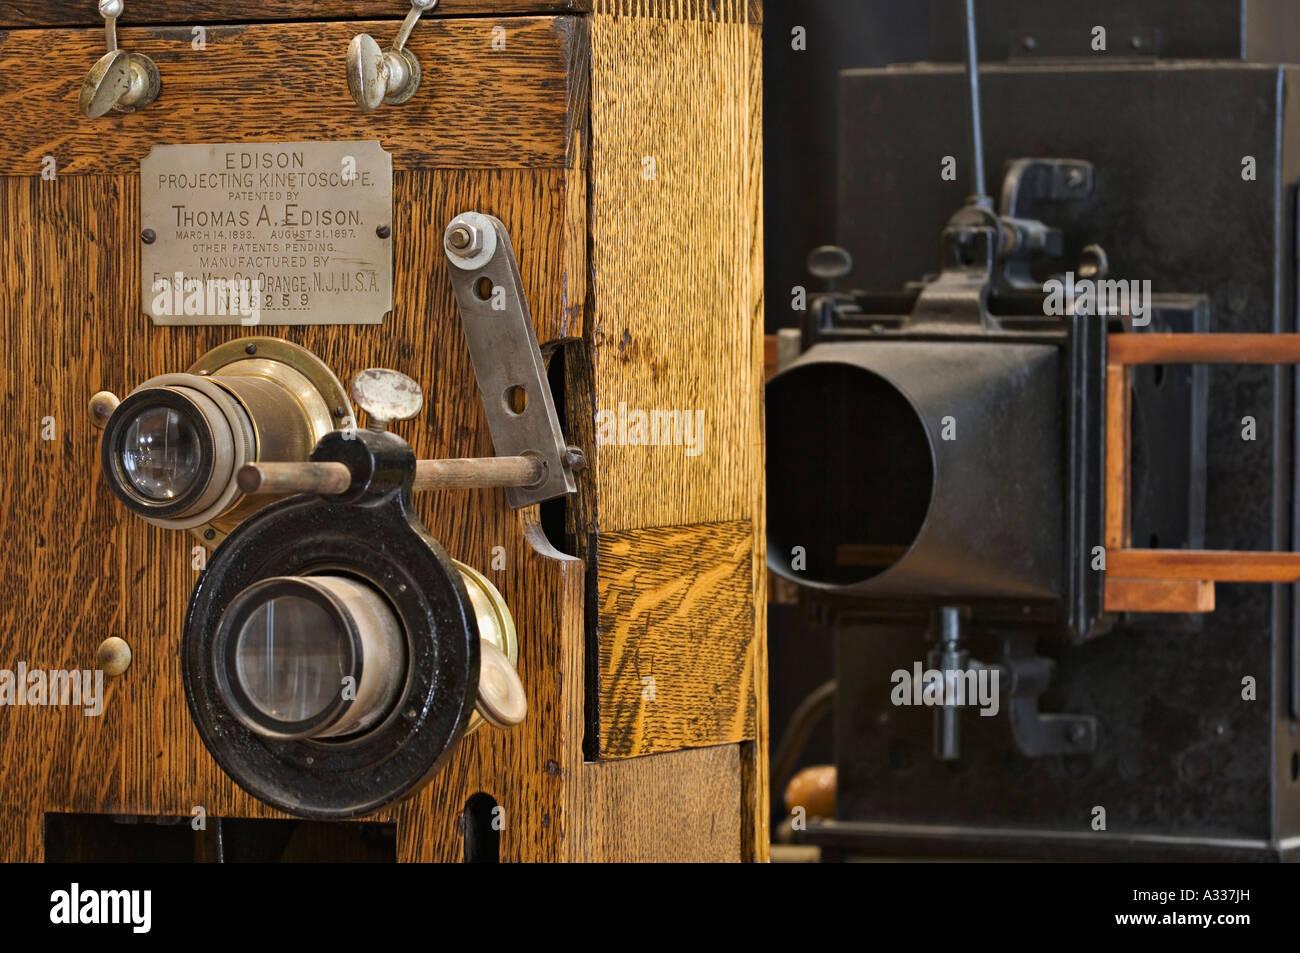 Edison Projecting Kinetoscope Thomas Edison House Louisville Kentucky - Stock Image